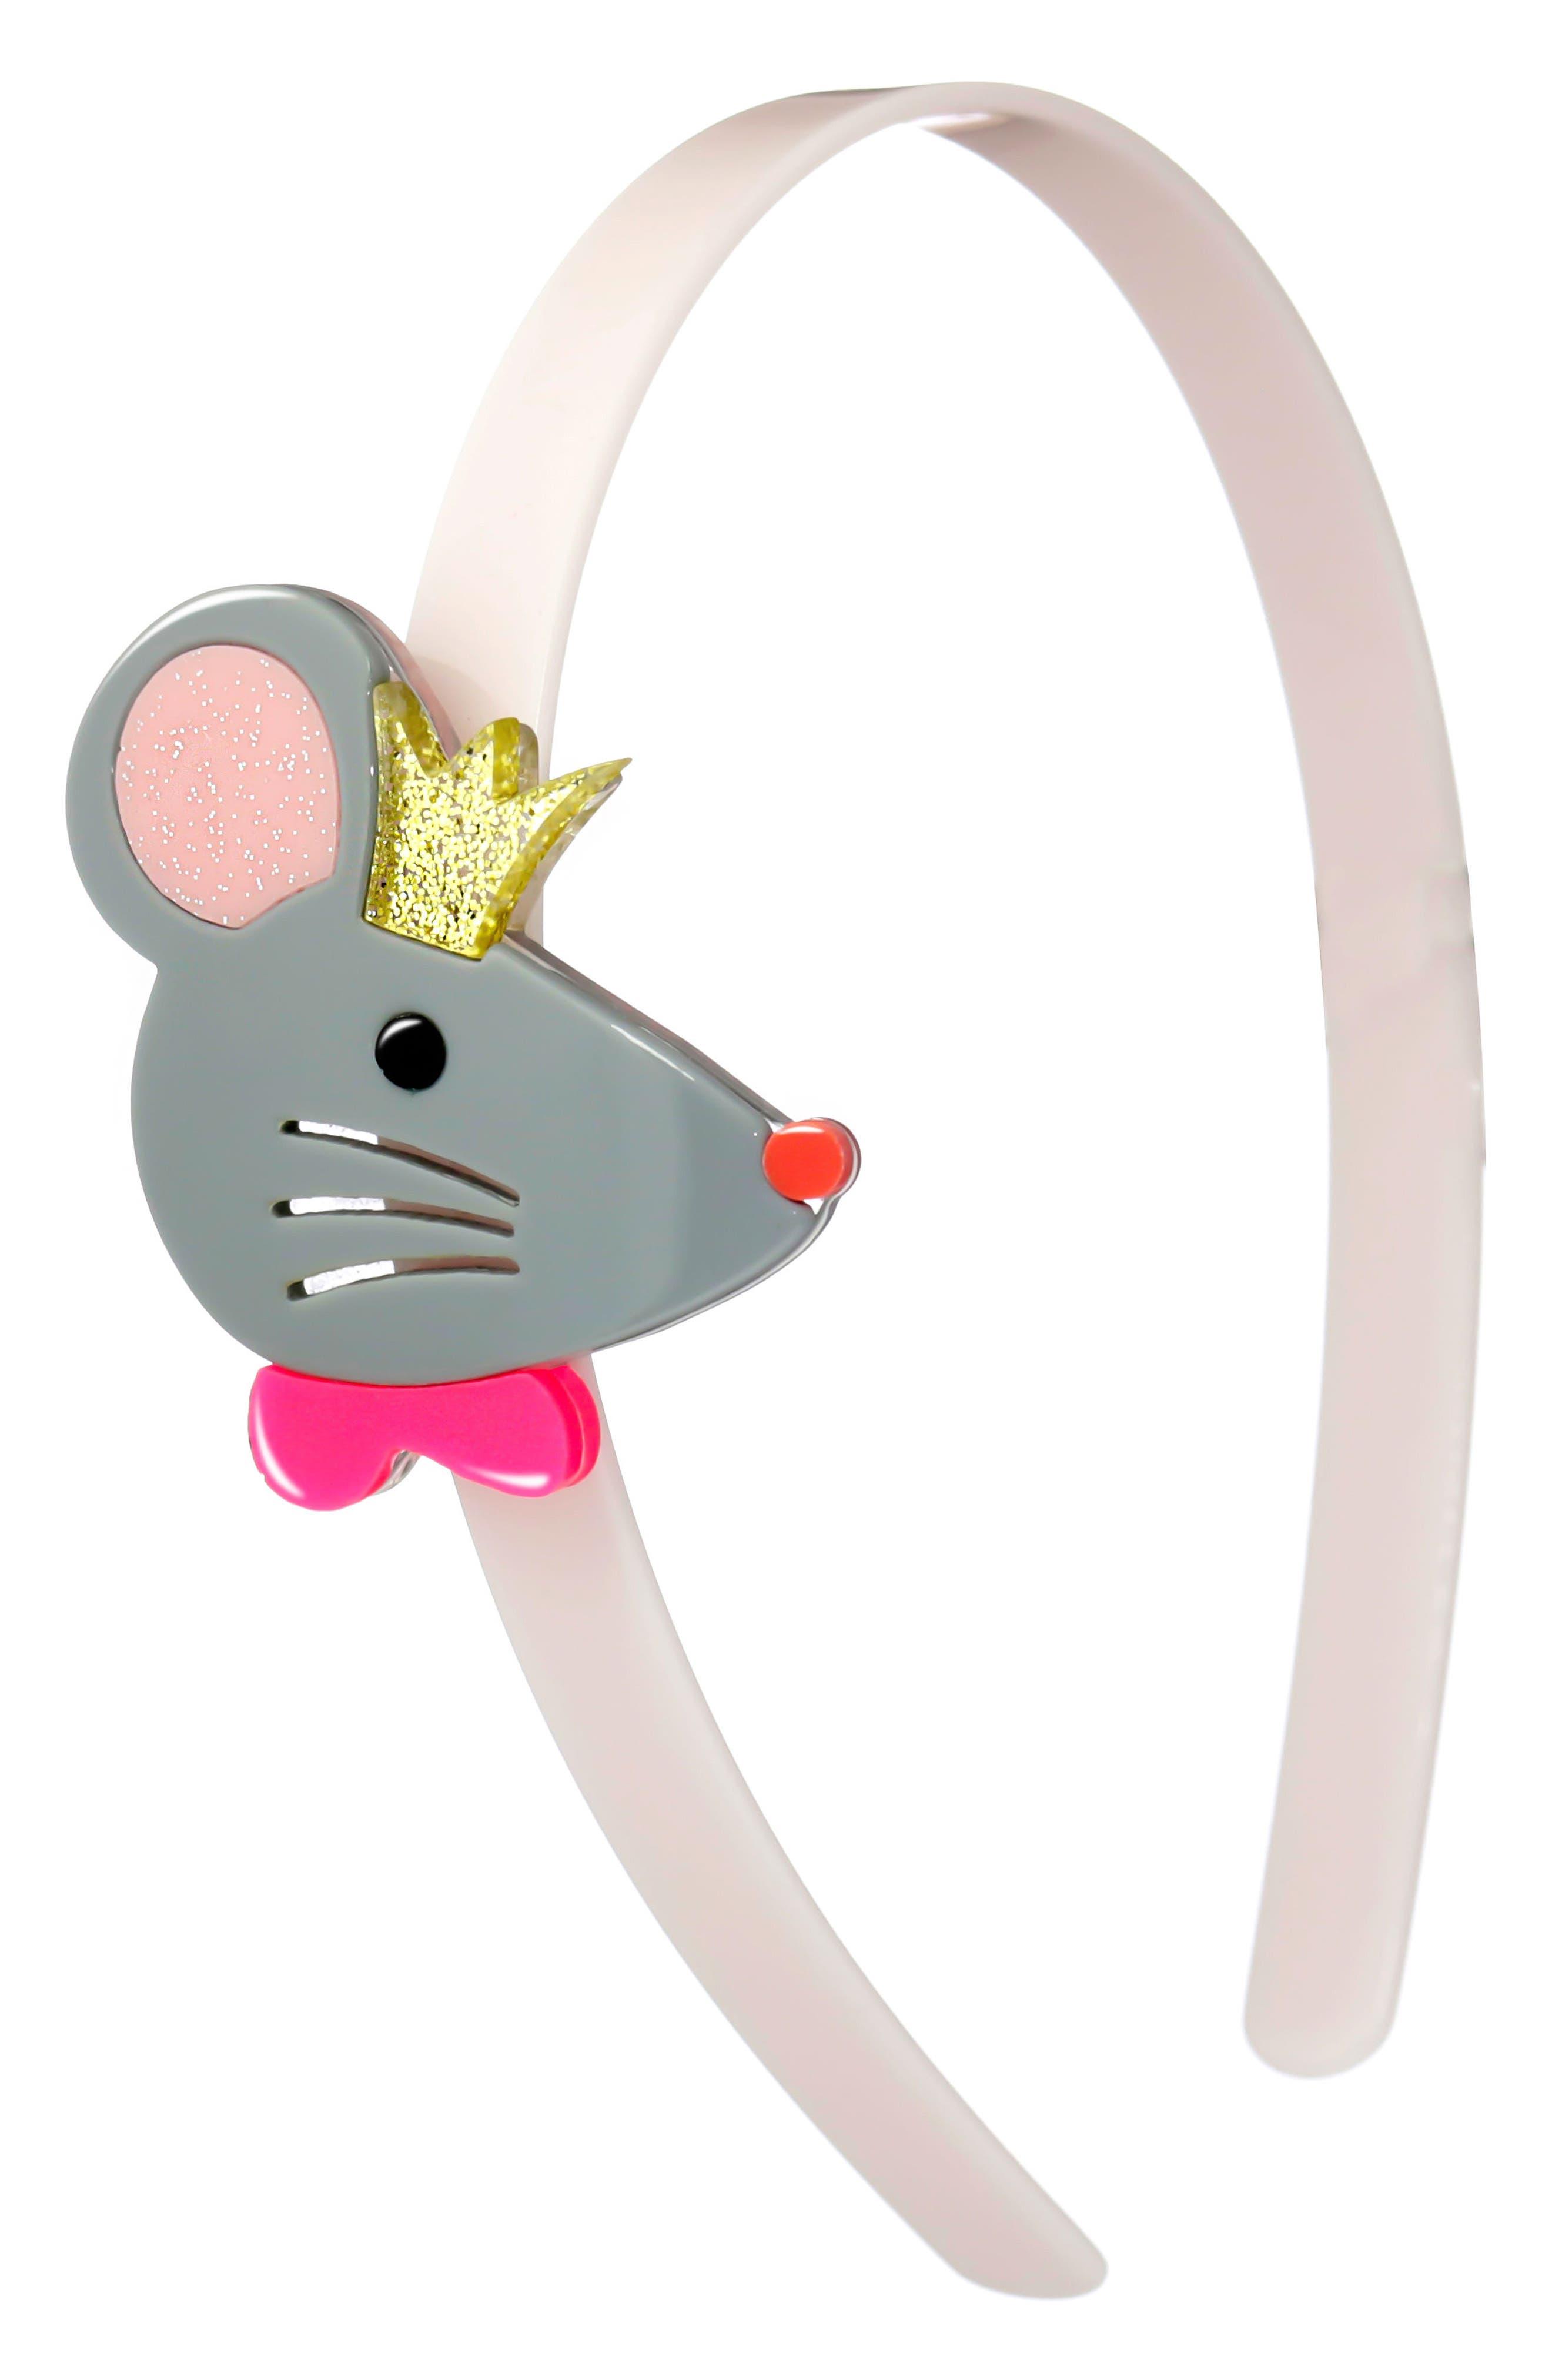 Alternate Image 1 Selected - Lilies & Roses NY Cinderella Mice Headband (Baby Girls)